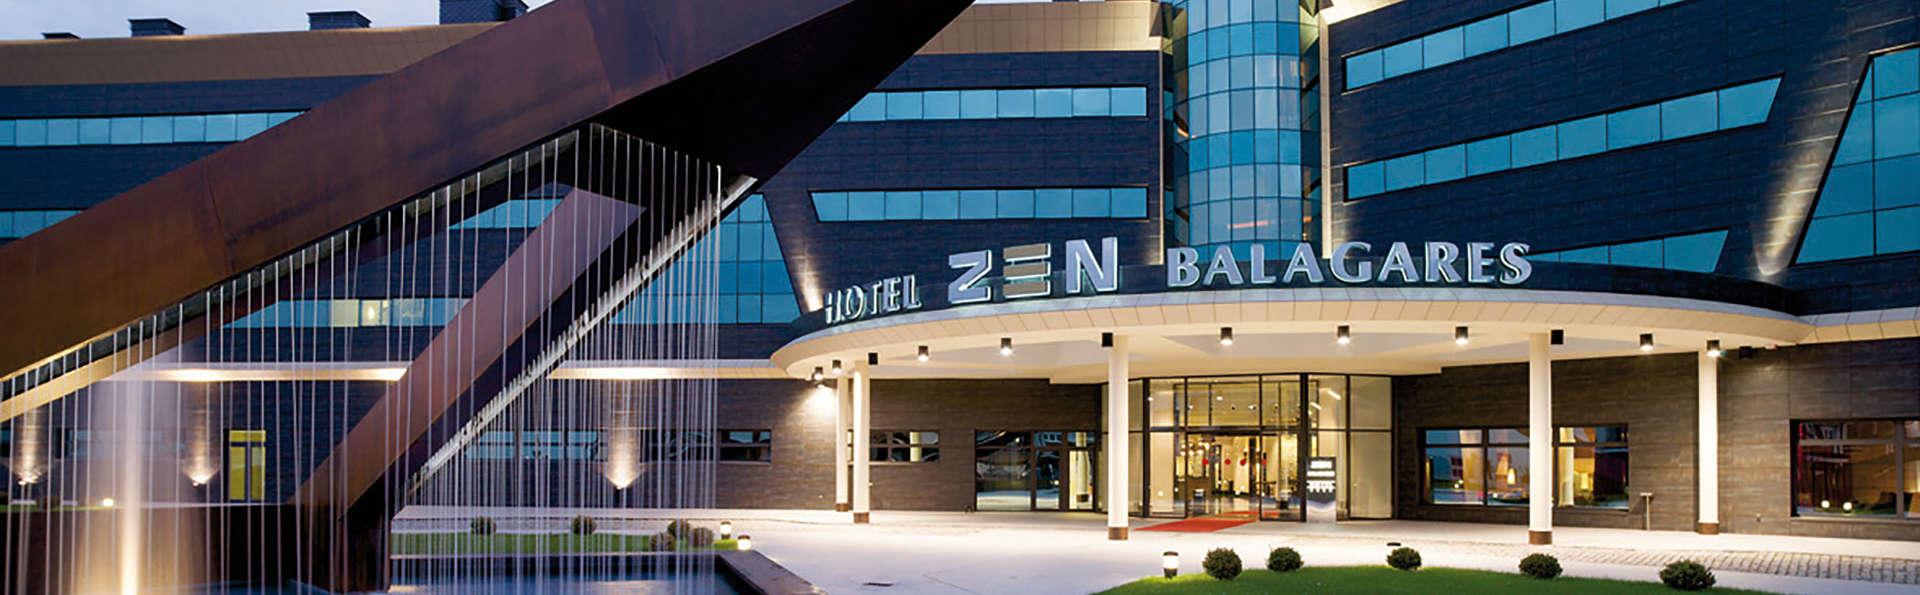 URH Hotel SPA Zen Balagares - EDIT_front.jpg